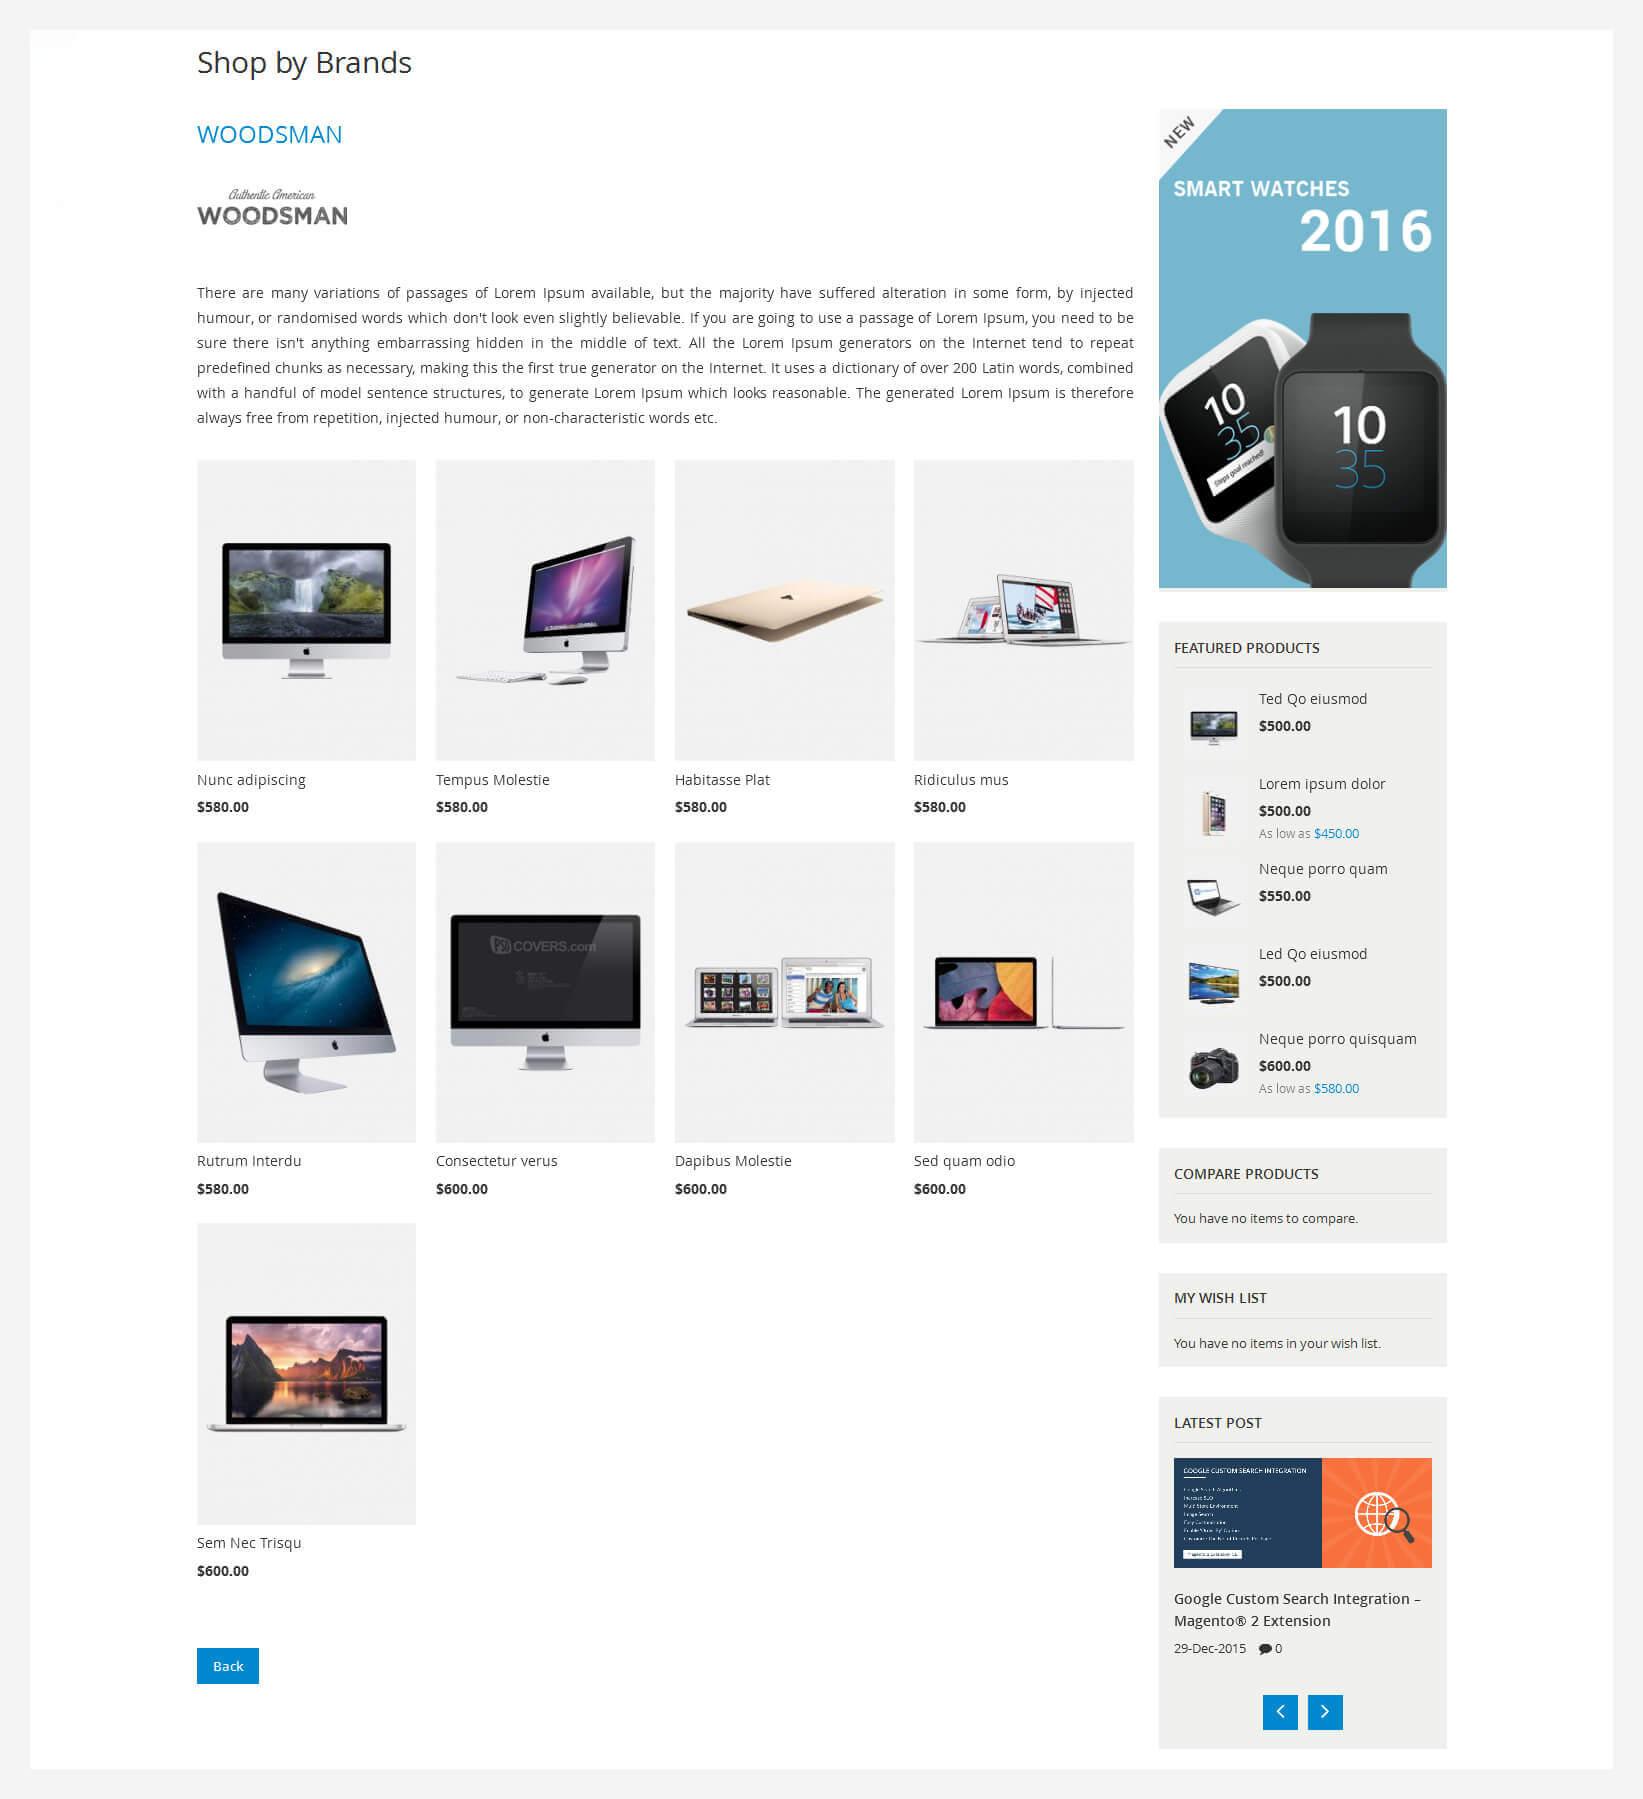 kosmic magento 2 theme brand details page